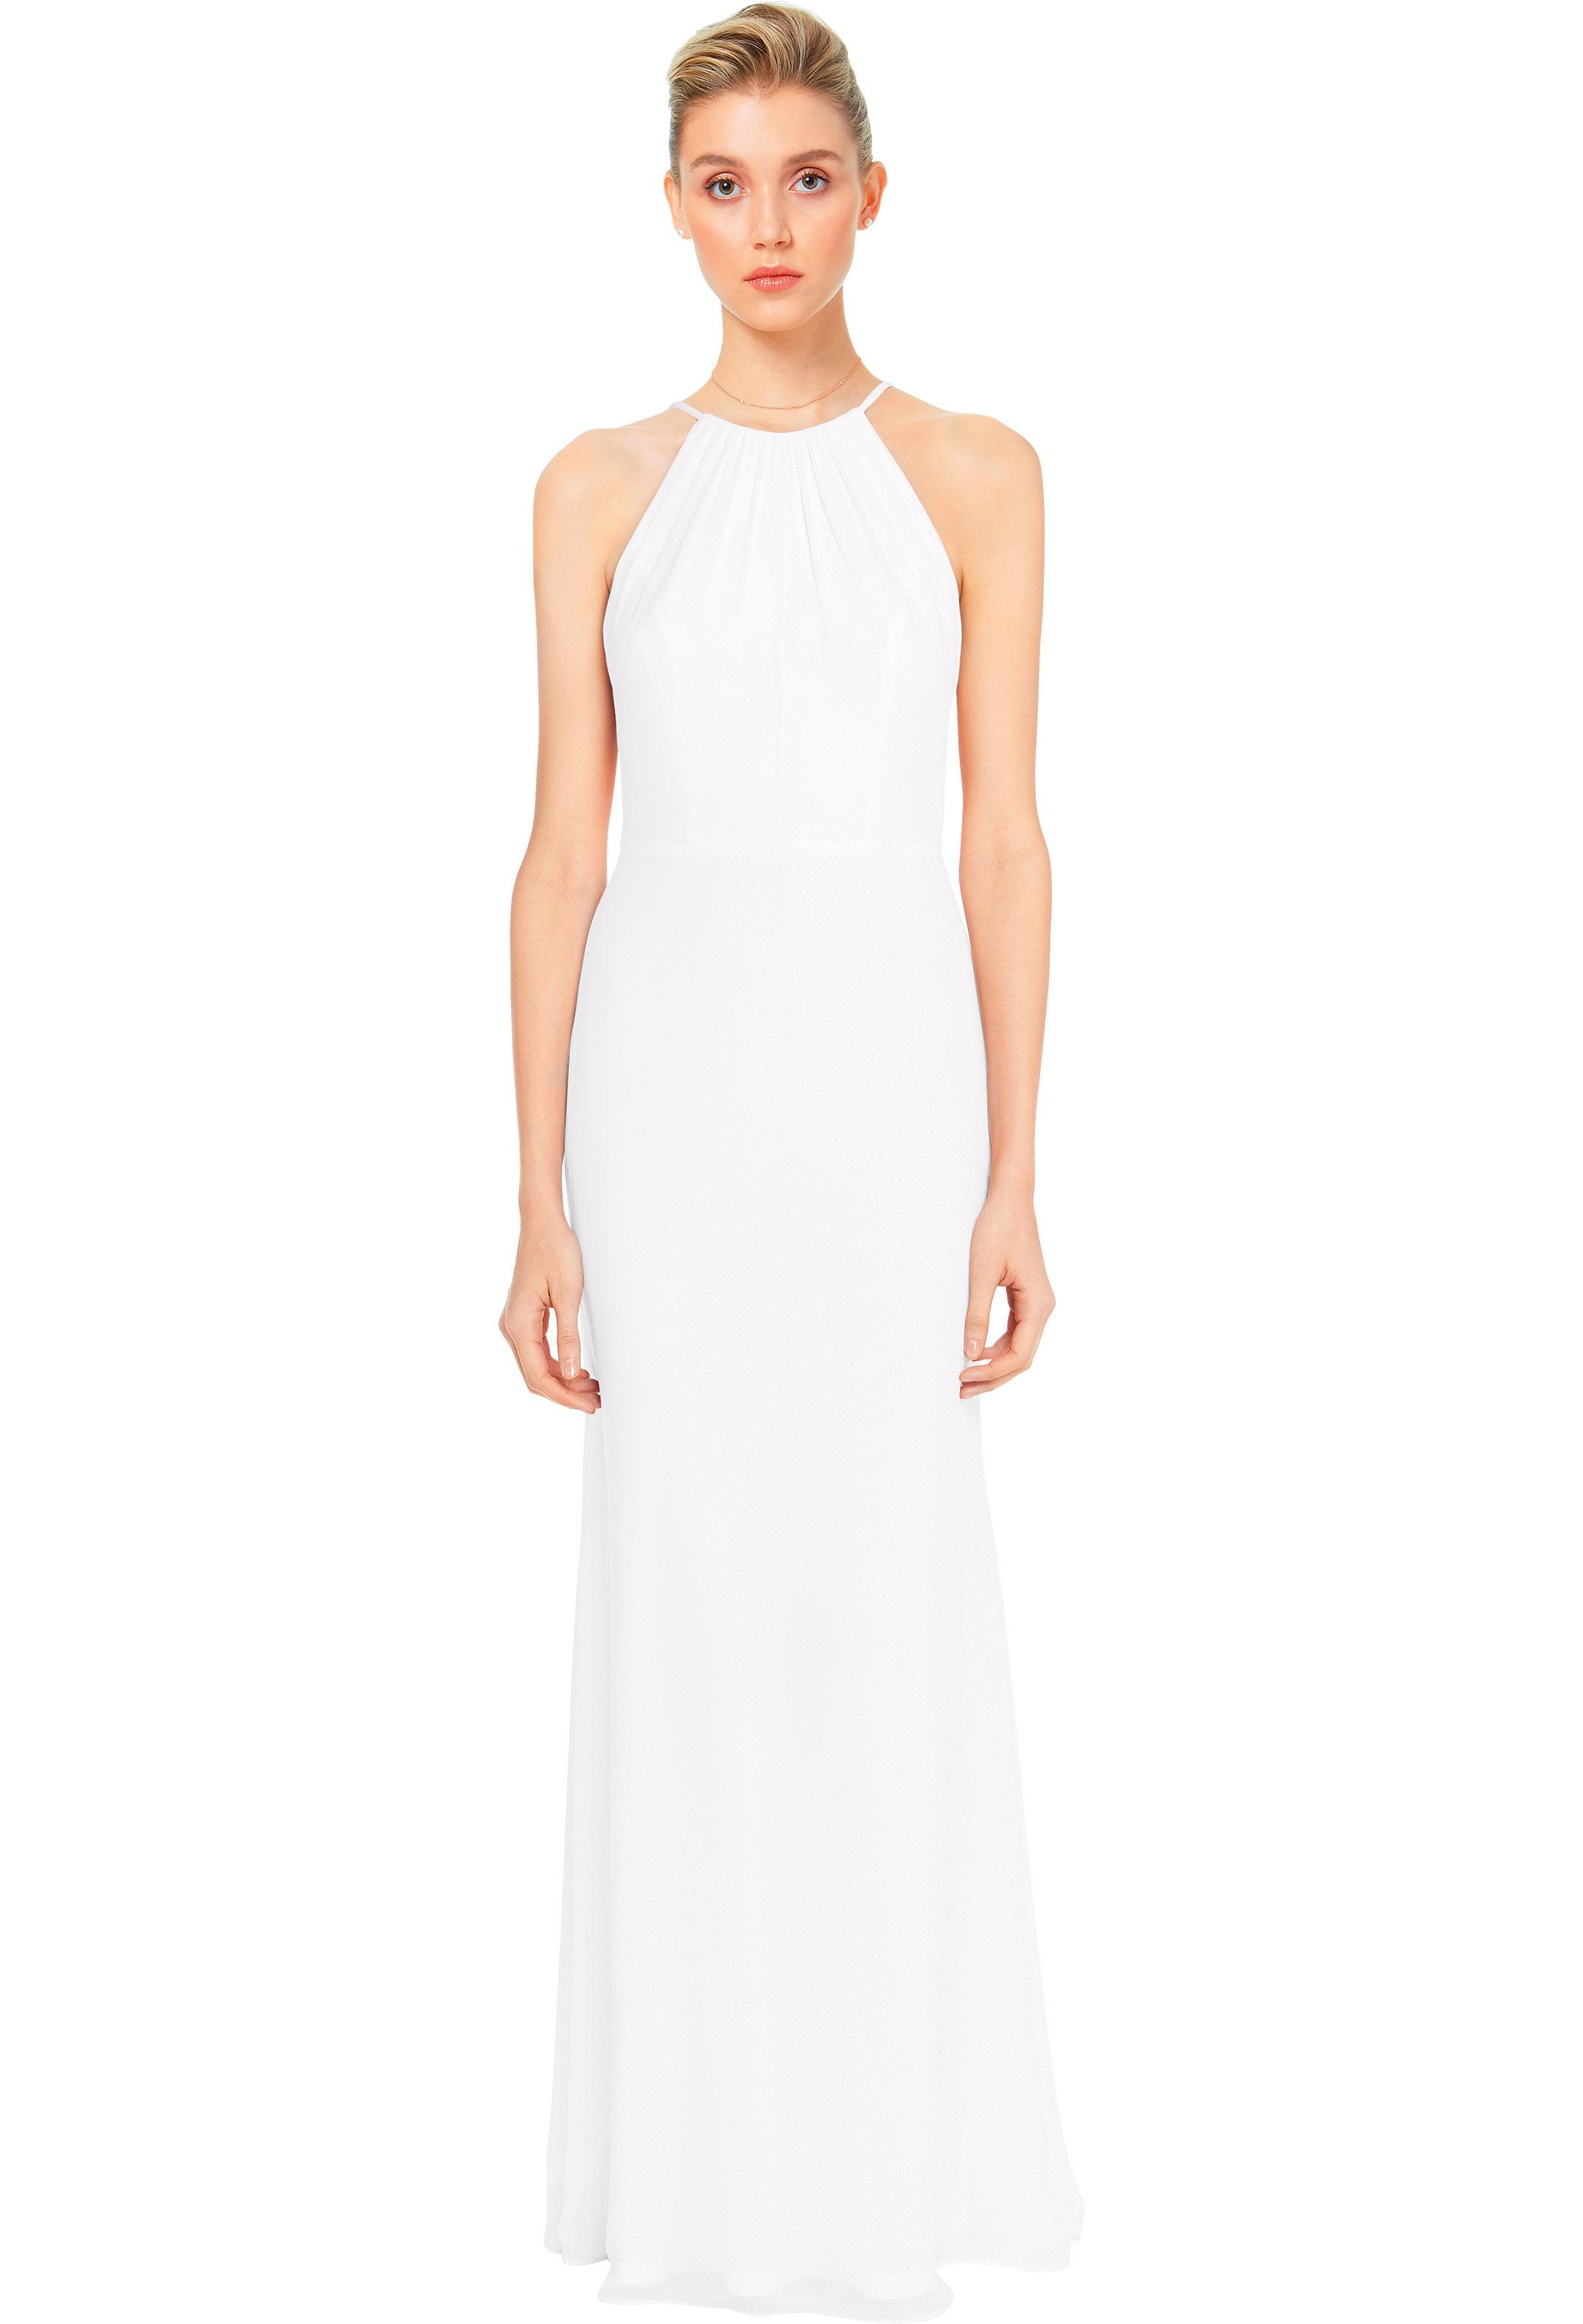 Bill Levkoff EVERGREEN Chiffon Spaghetti Strap A-line gown, $158.00 Front